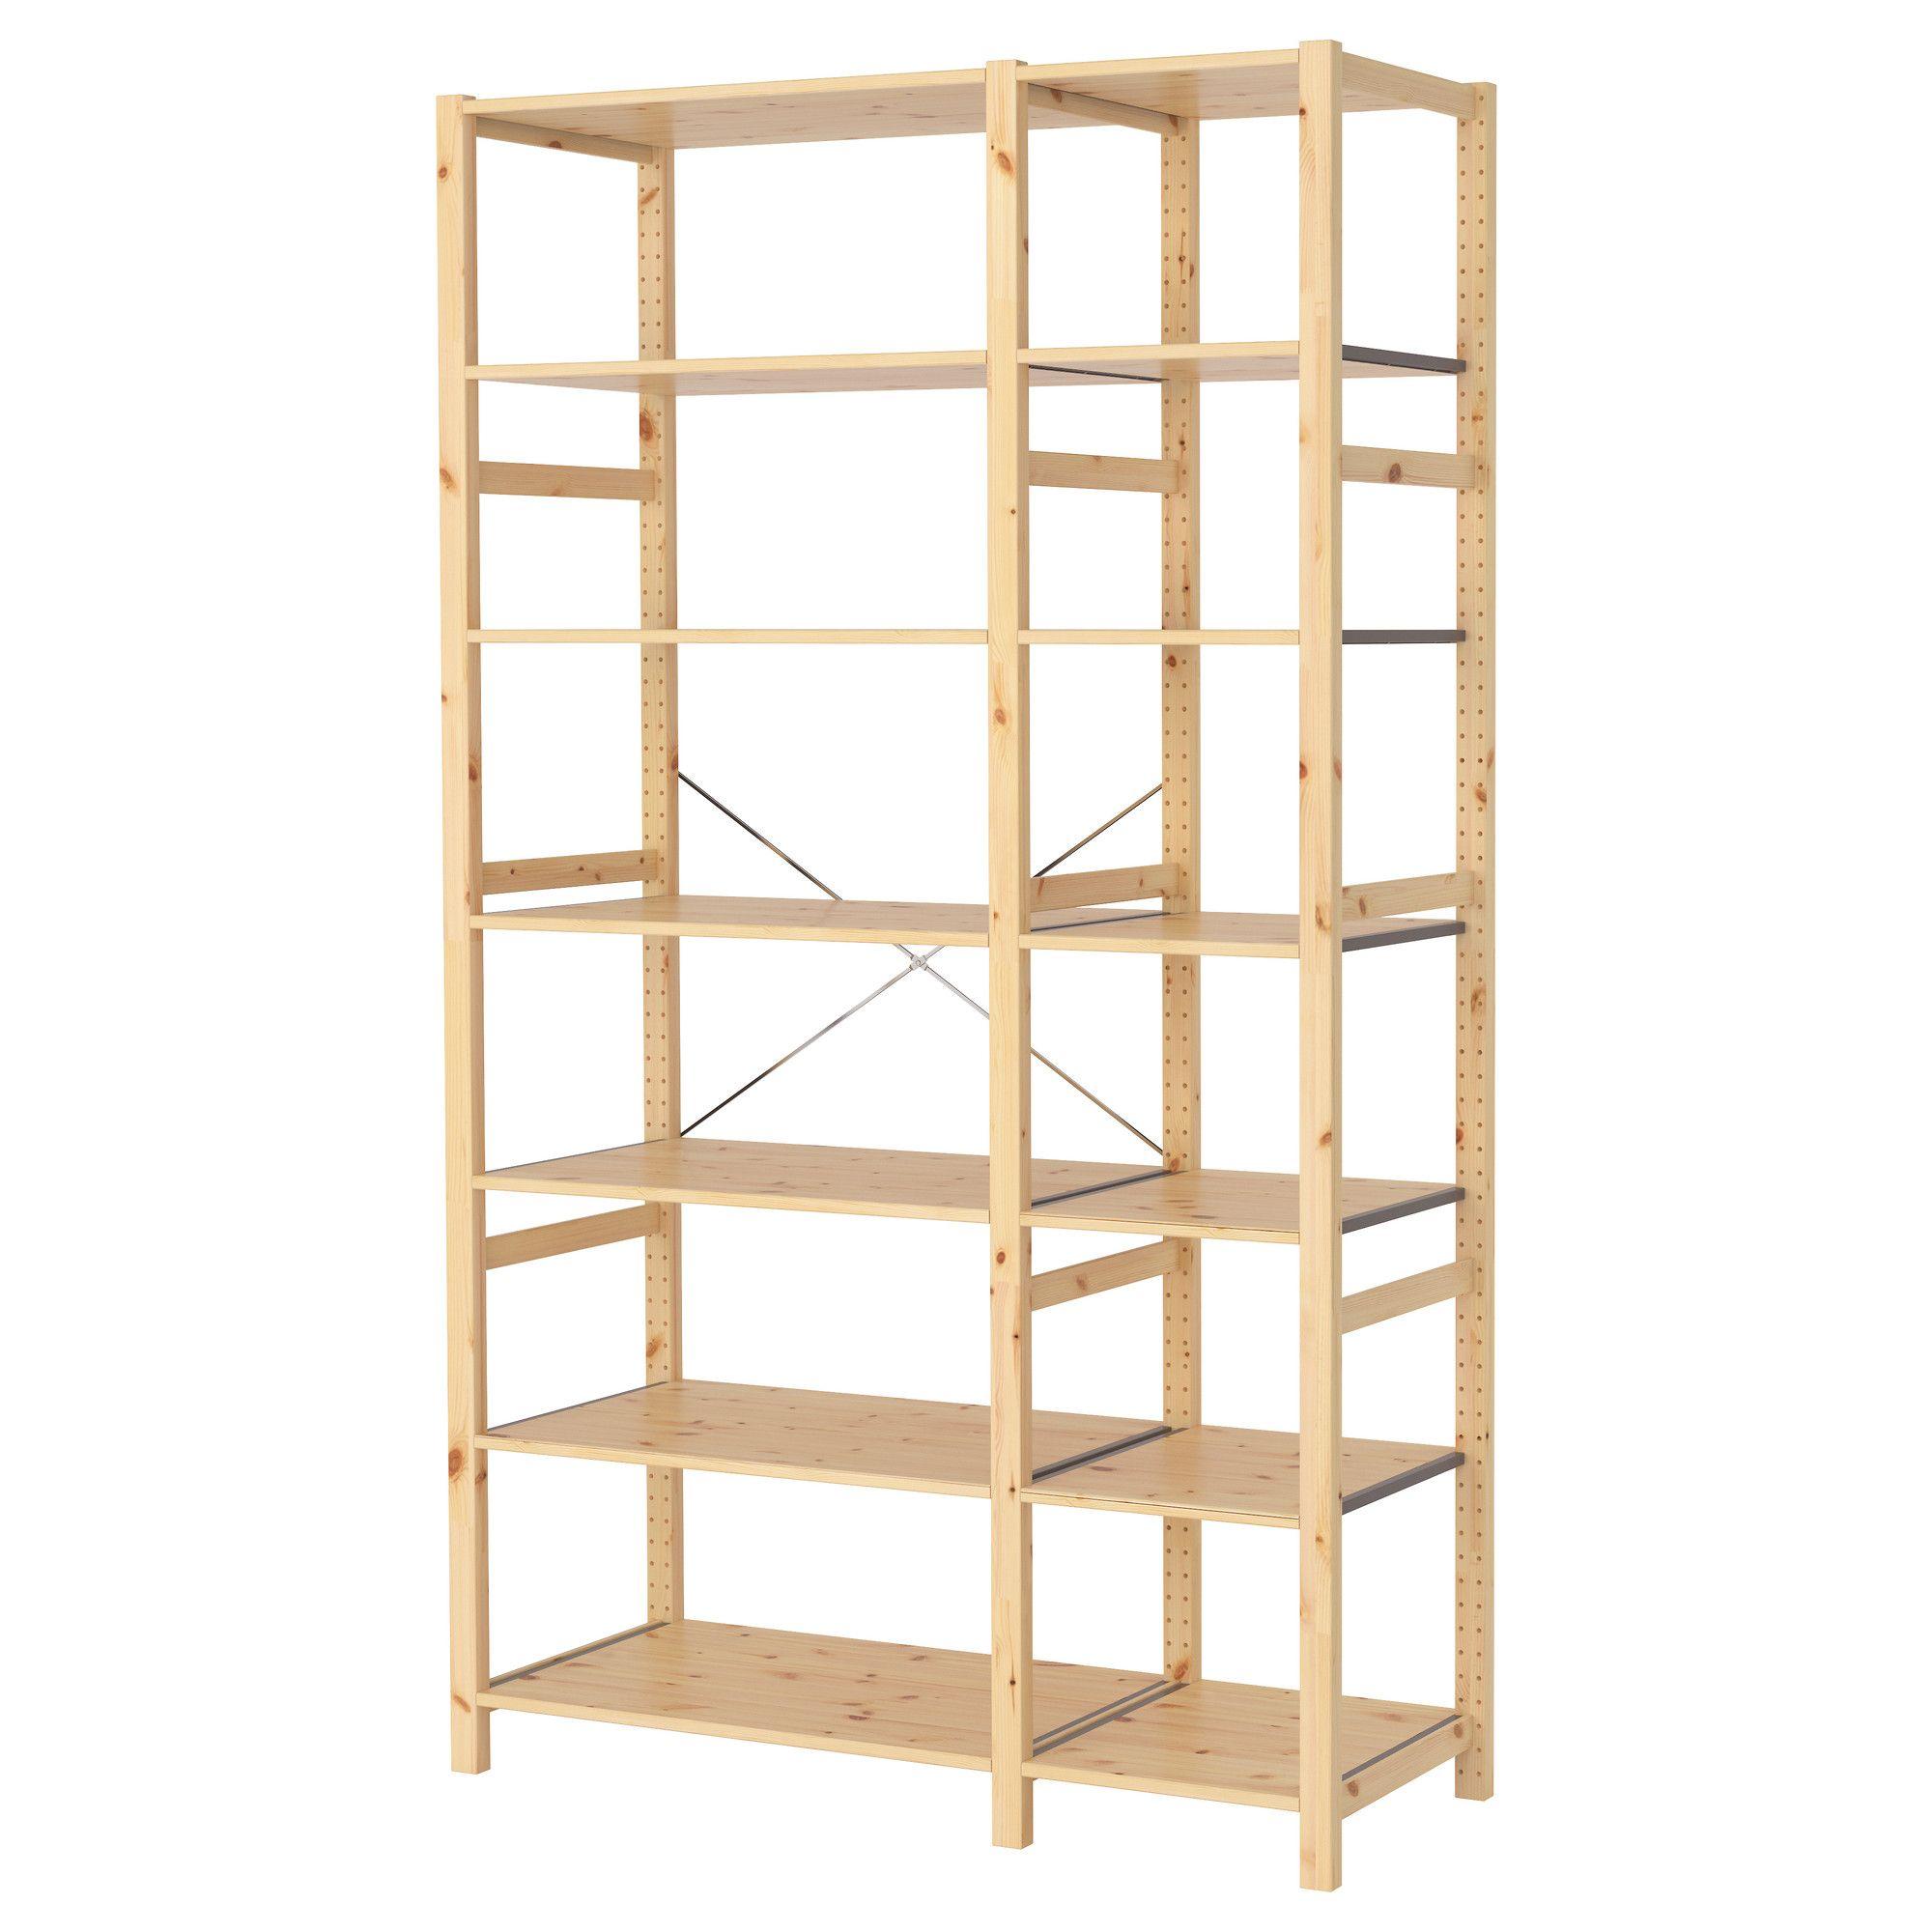 Ikea Kellerregal ivar 2 section shelving unit pine shelving storage ideas and room